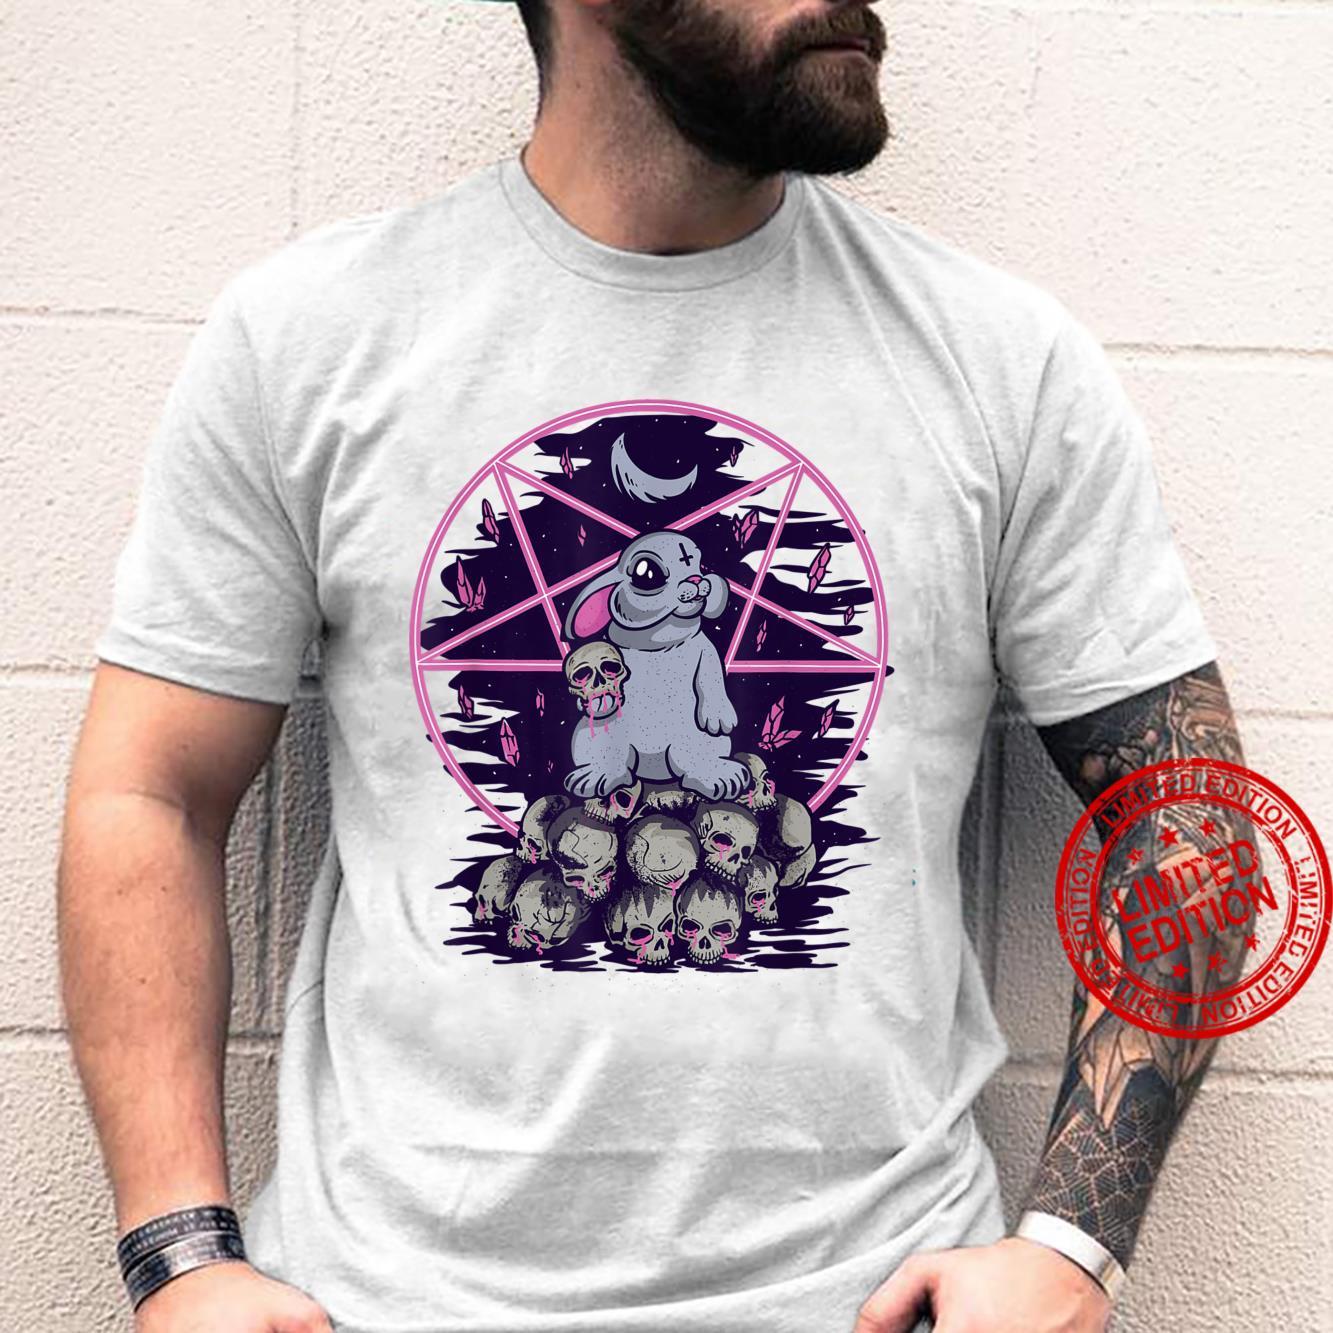 Goth Devil Rabbit Satanic Pastel Goth Emo Gothic Aesthetic Shirt